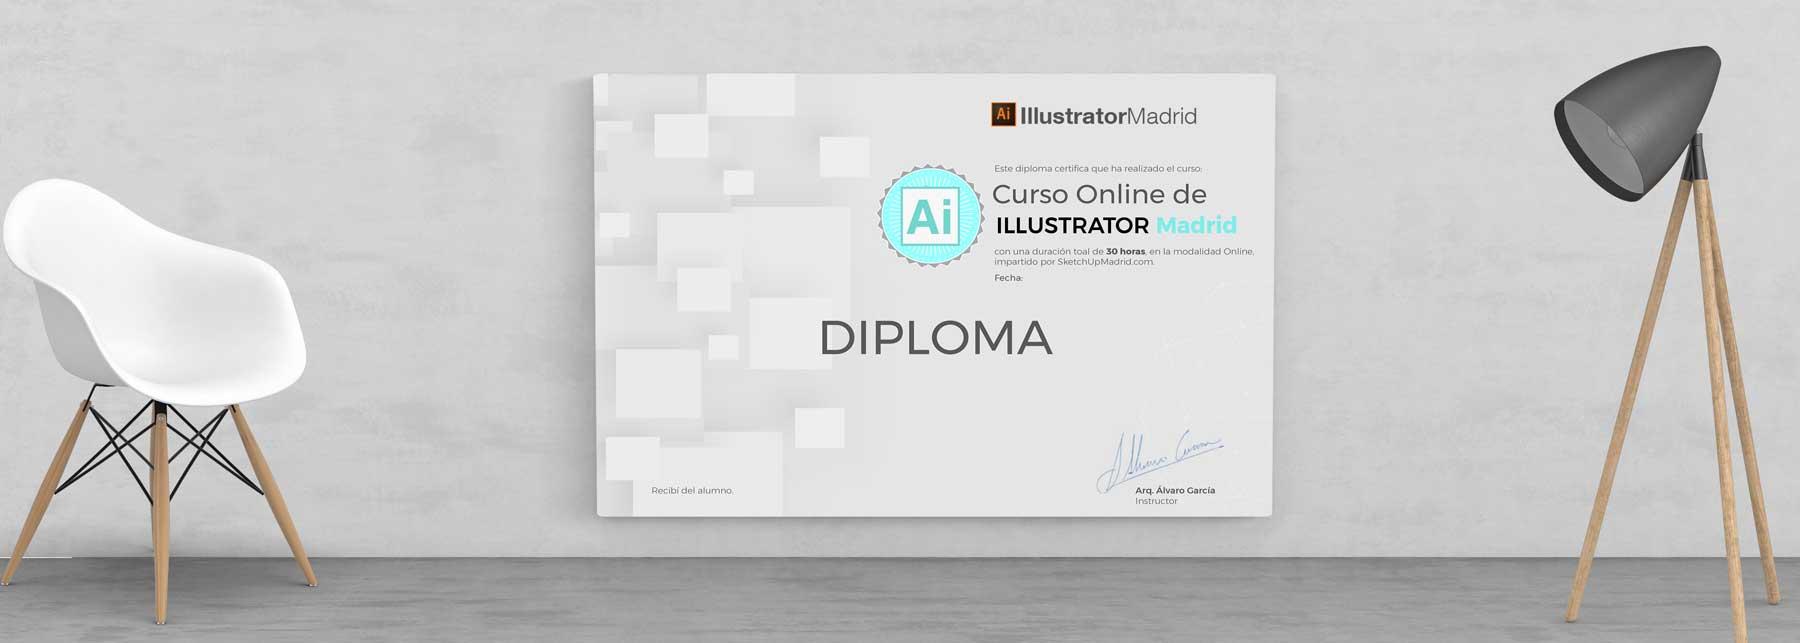 Curso Online Illustrator